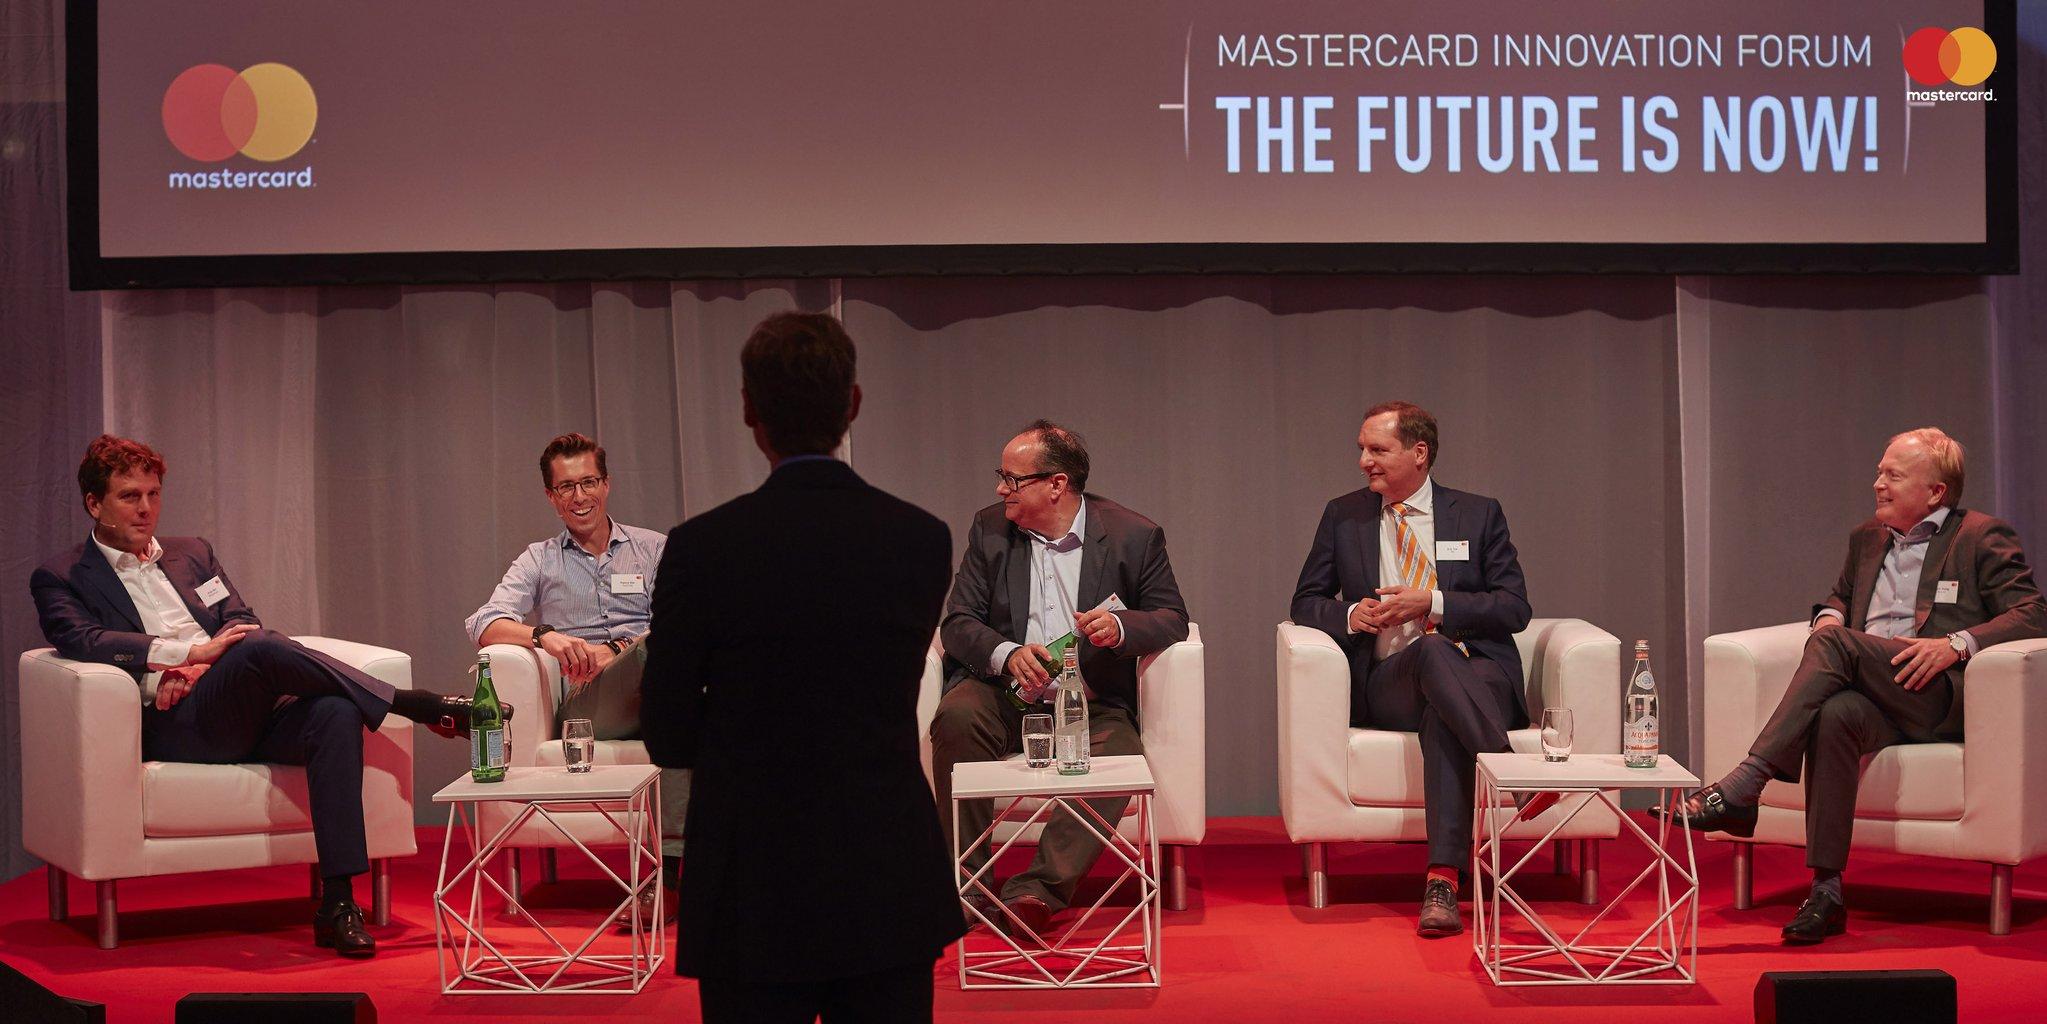 mastercard-innovation-forum-2